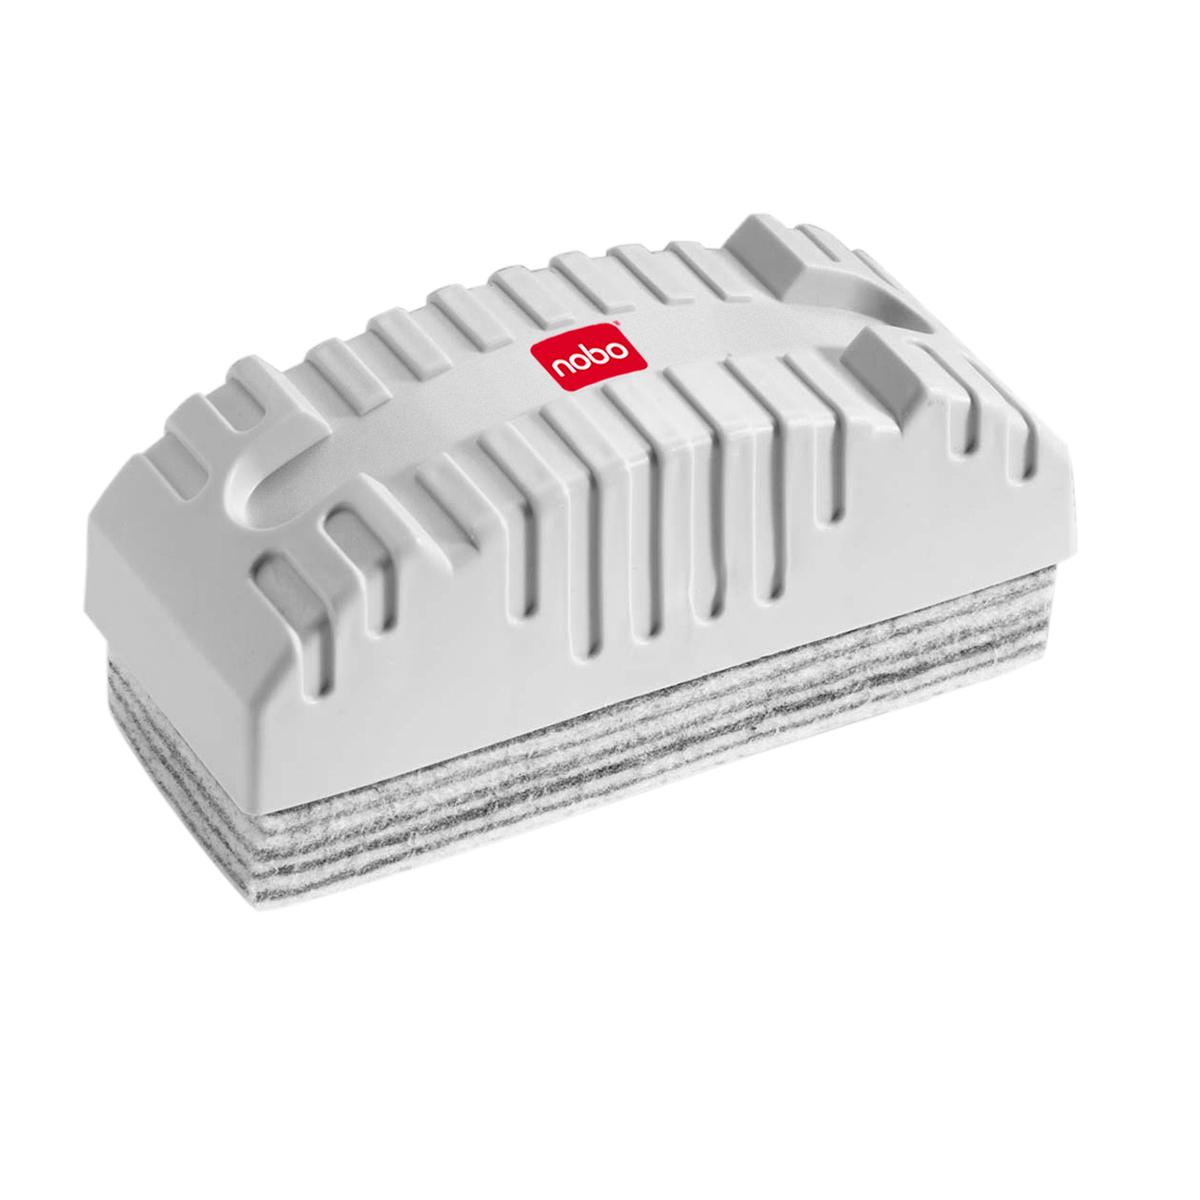 Nobo 34533944 Easypeel Drywipe Eraser